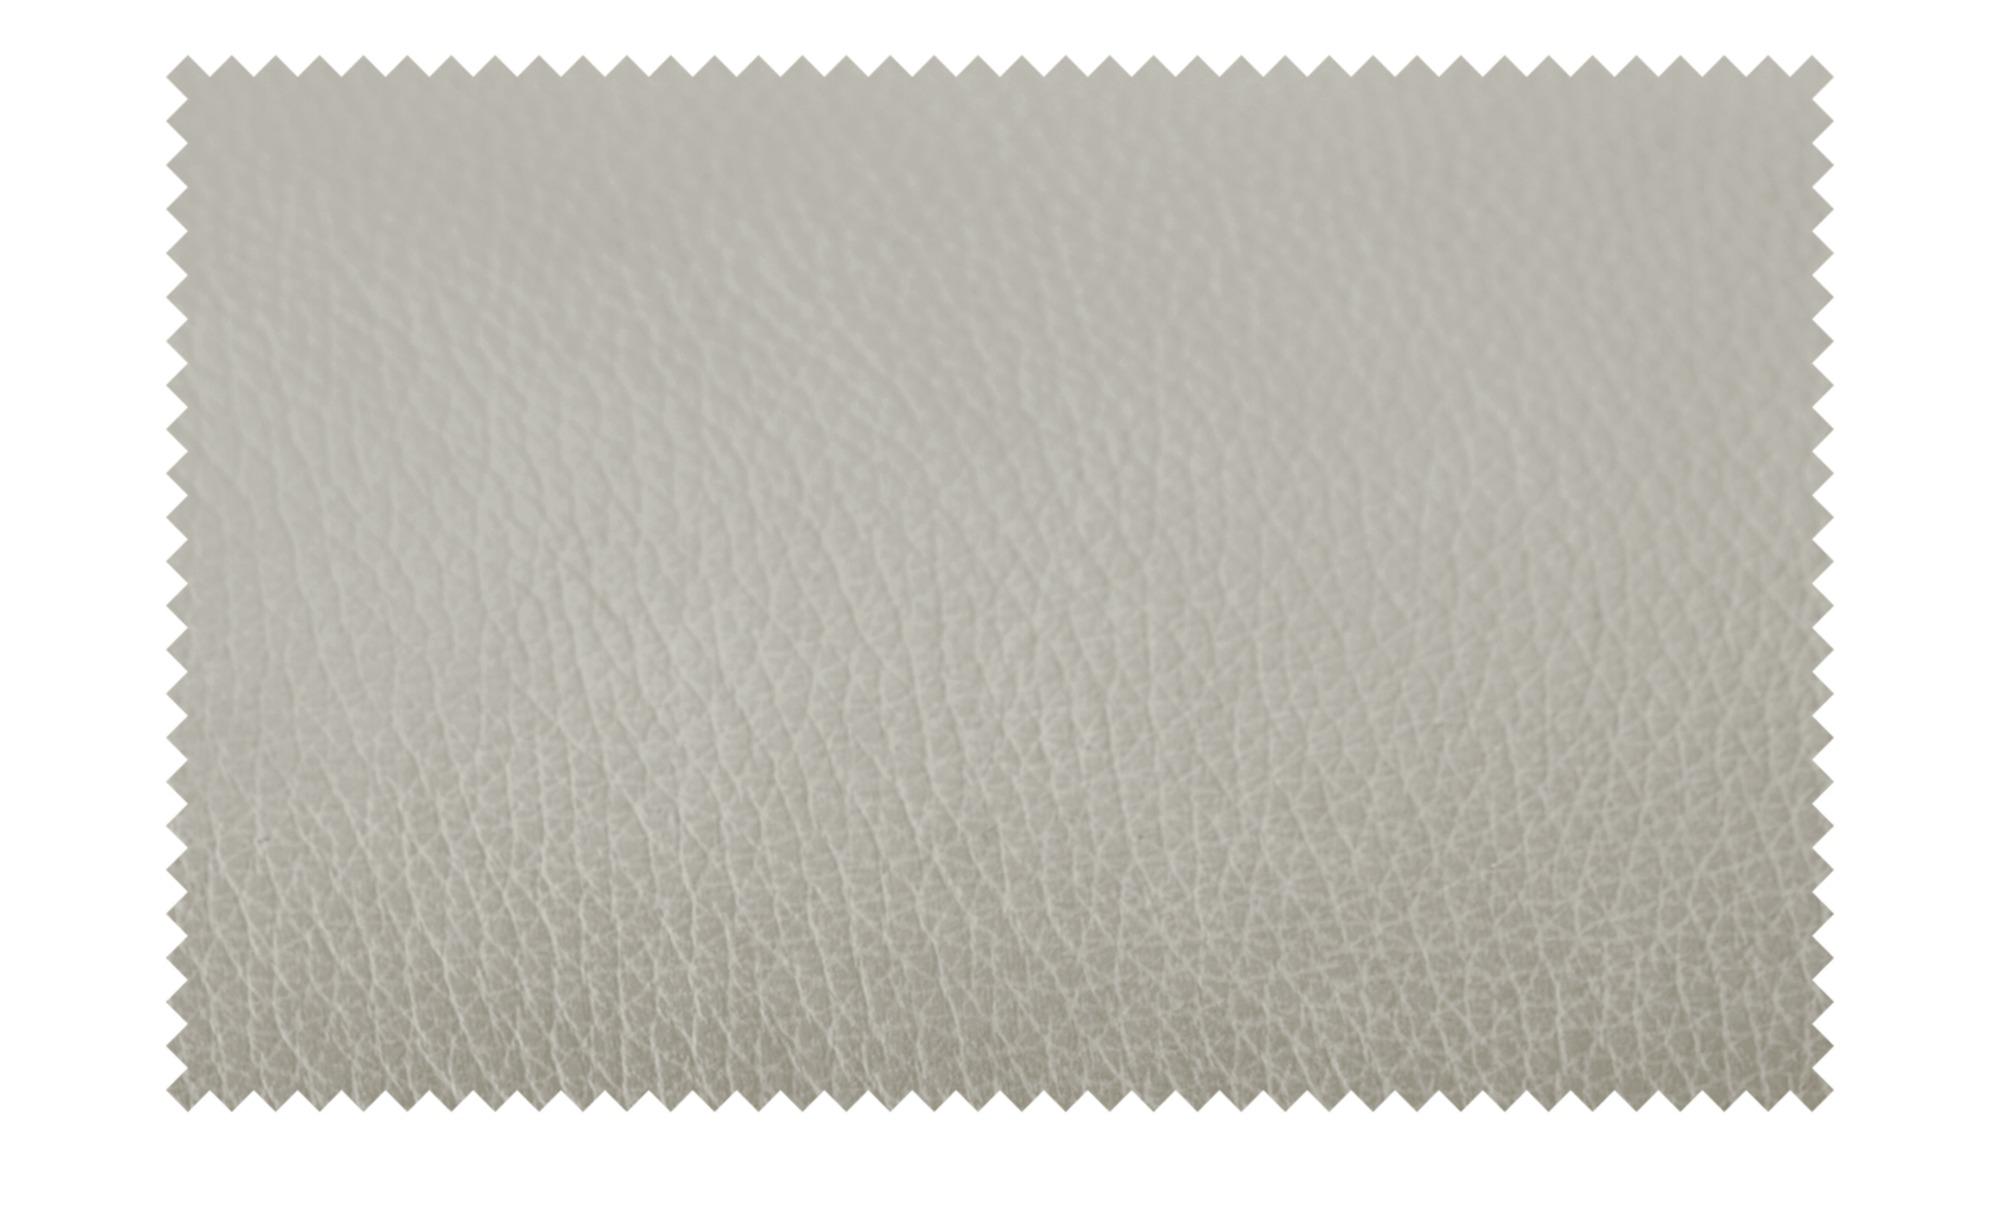 Relax-Sessel aus Leder creme - Leder Viktoria ¦ creme ¦ Maße (cm): B: 83 H: 107 T: 88 Polstermöbel > Sessel > Fernsehsessel - Höffner